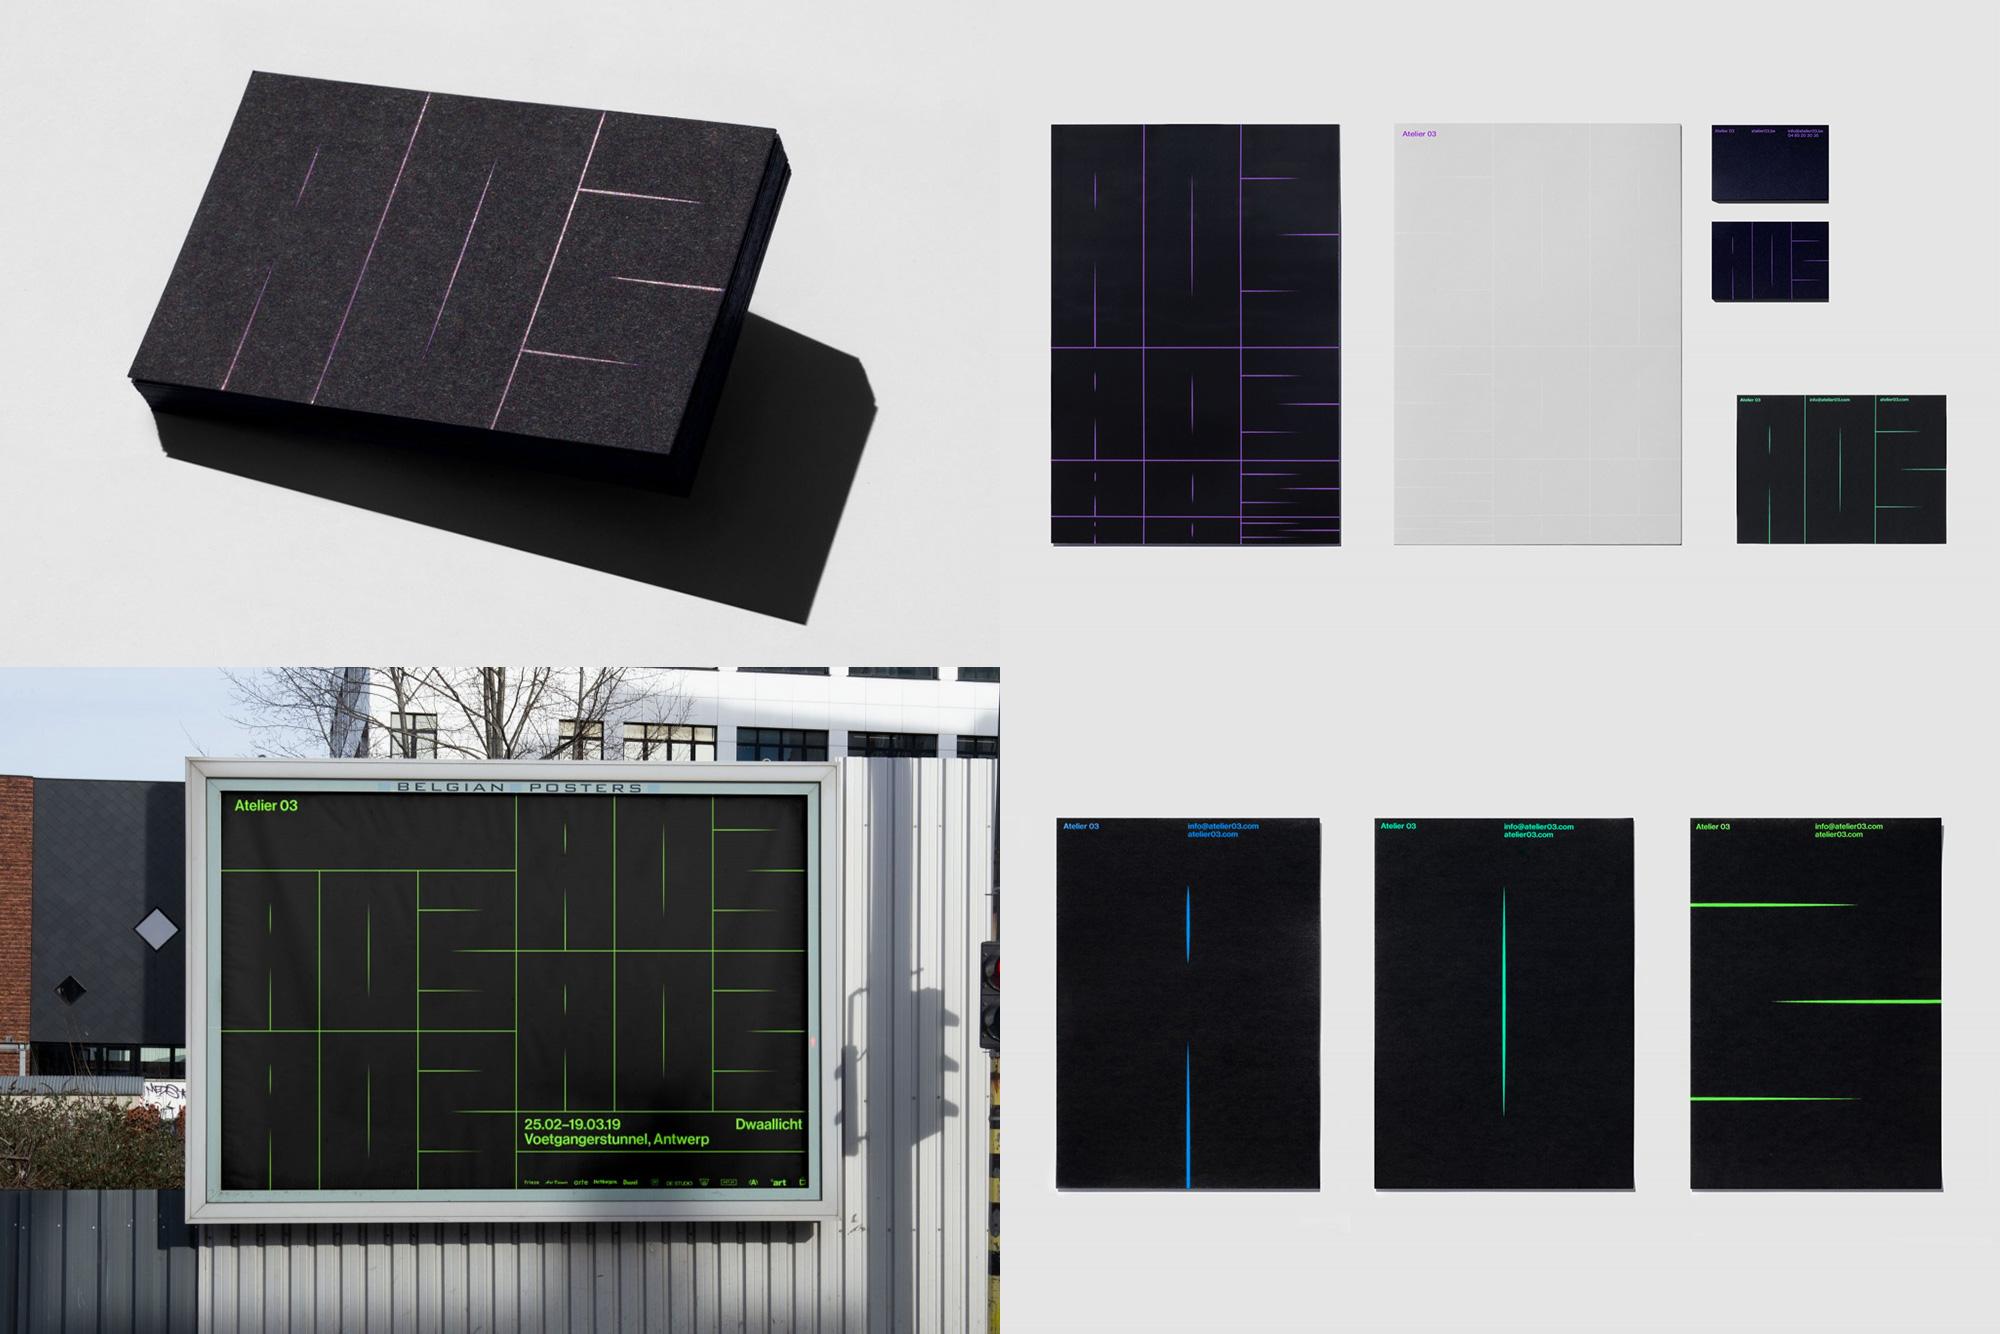 Atelier 03 by Vrints-Kolsteren